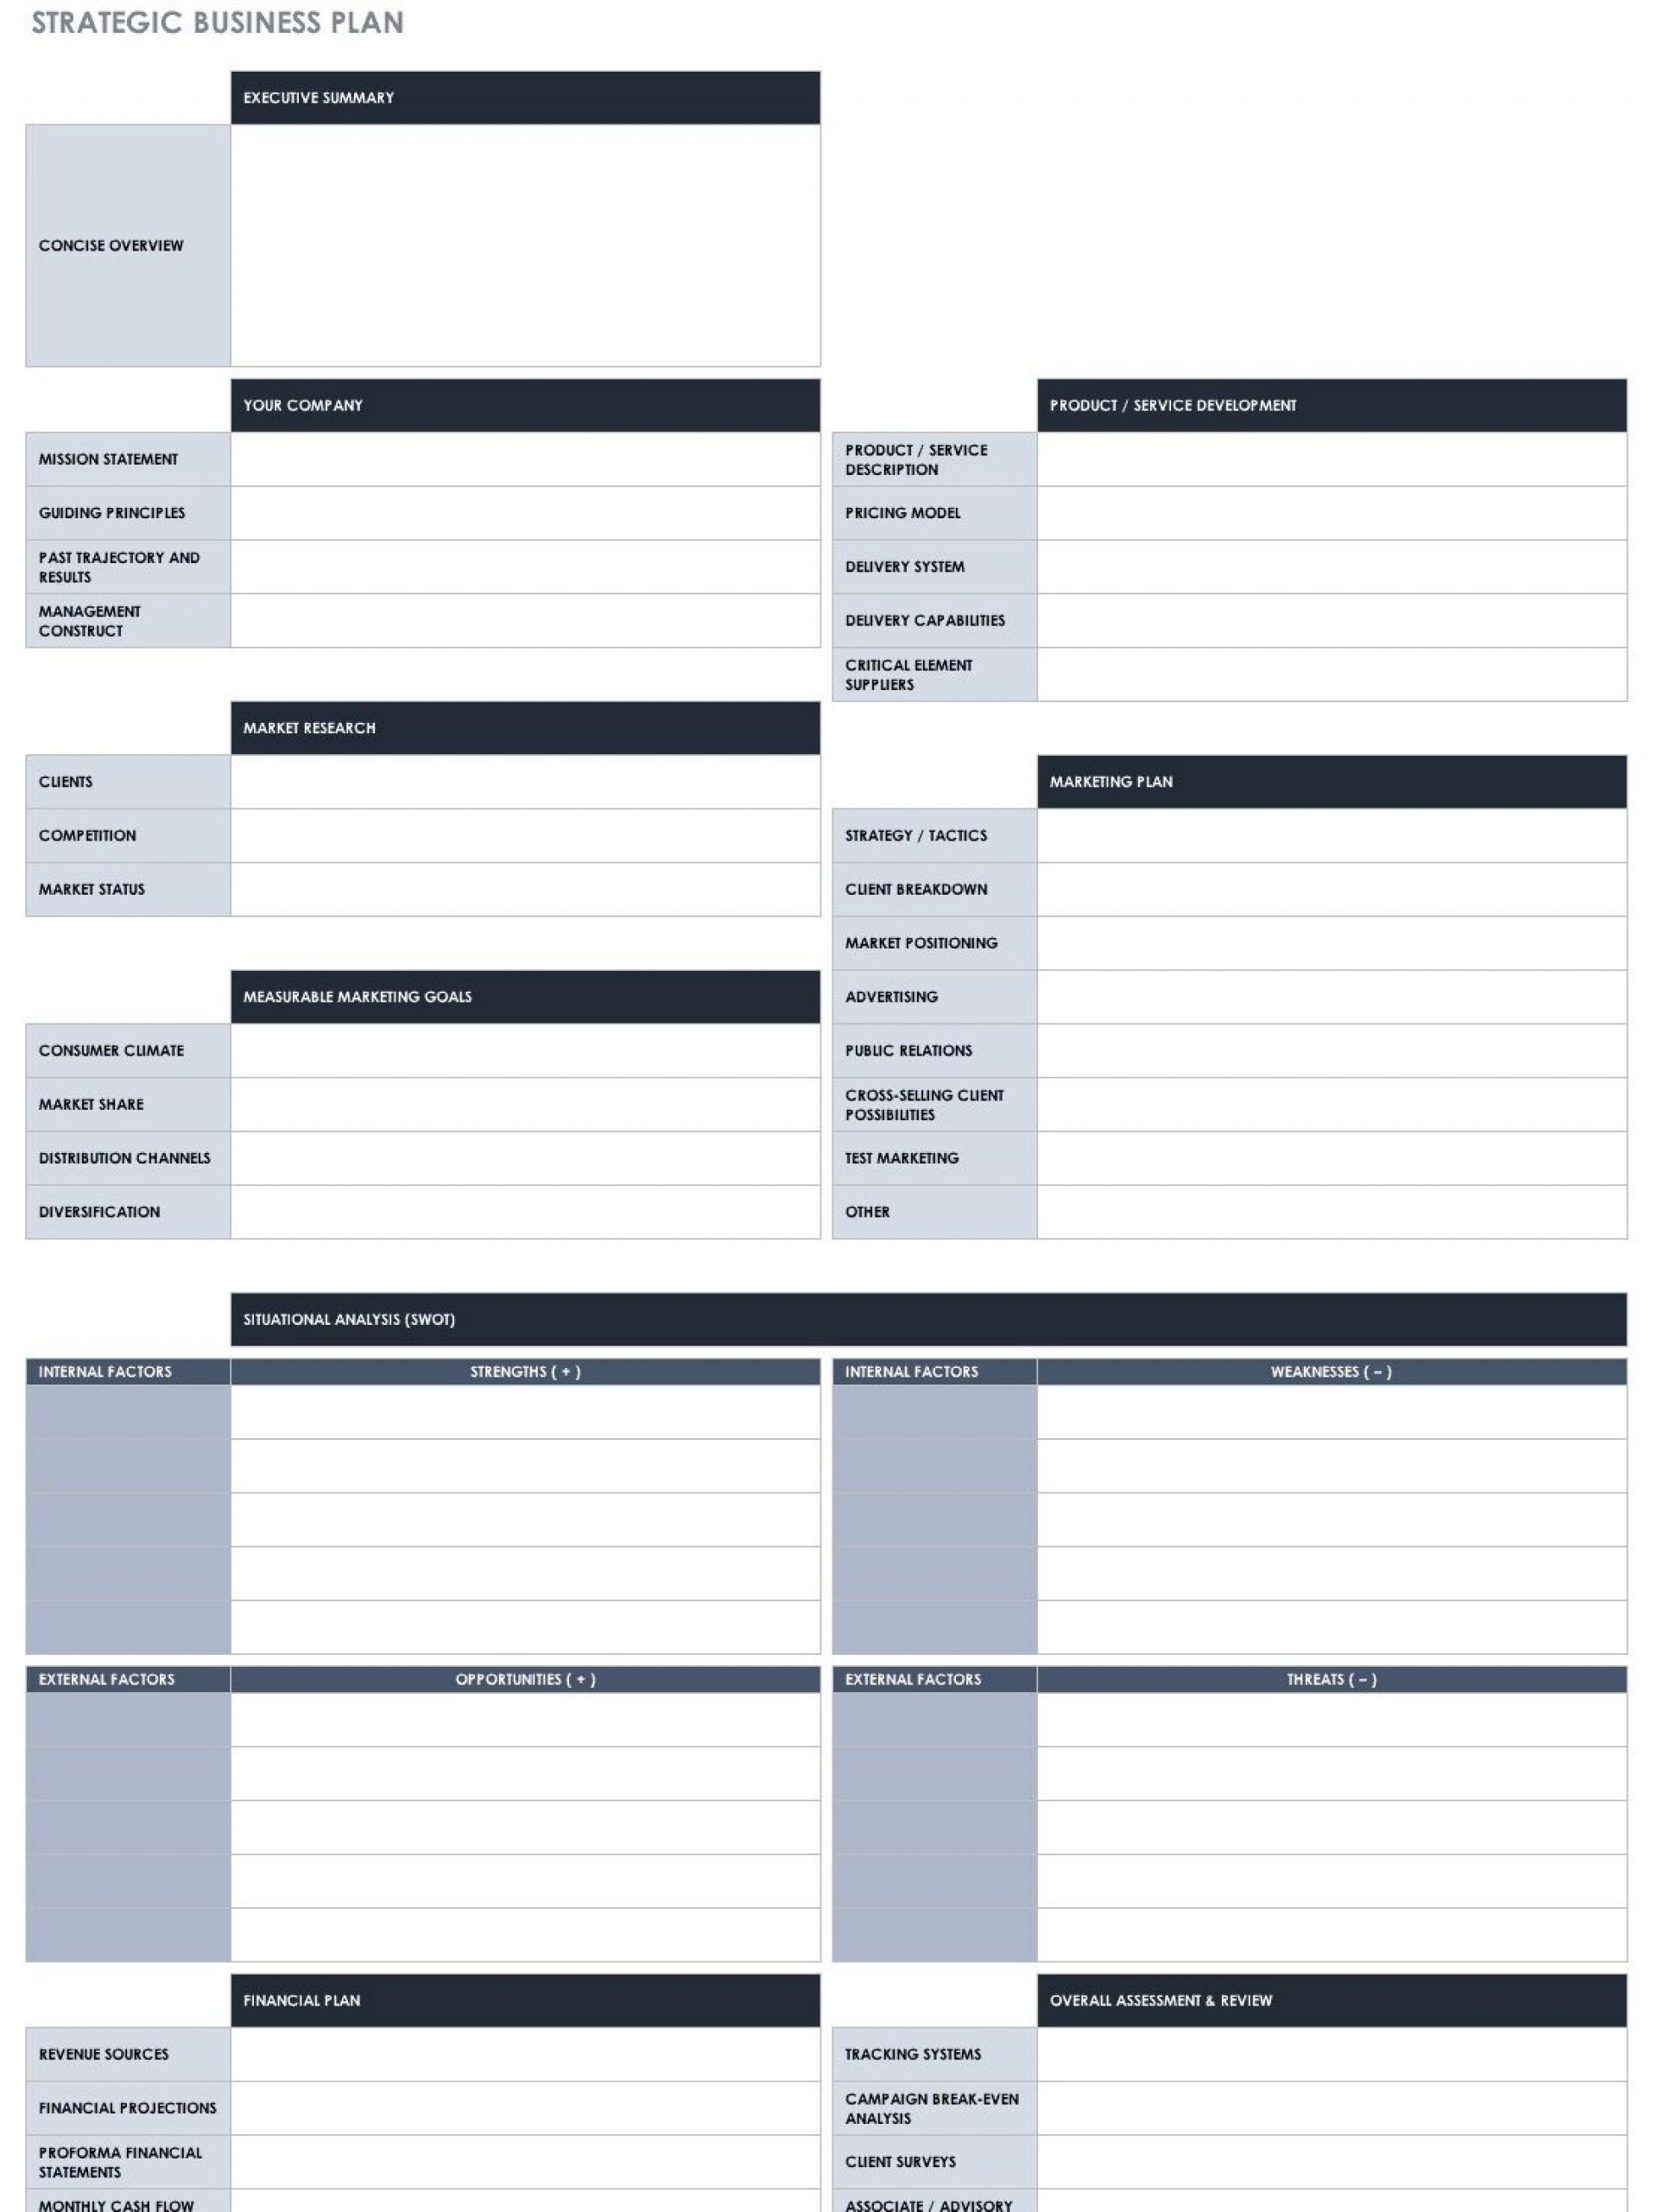 007 Impressive Strategic Busines Plan Template Highest Quality  Doc Word Sample1920